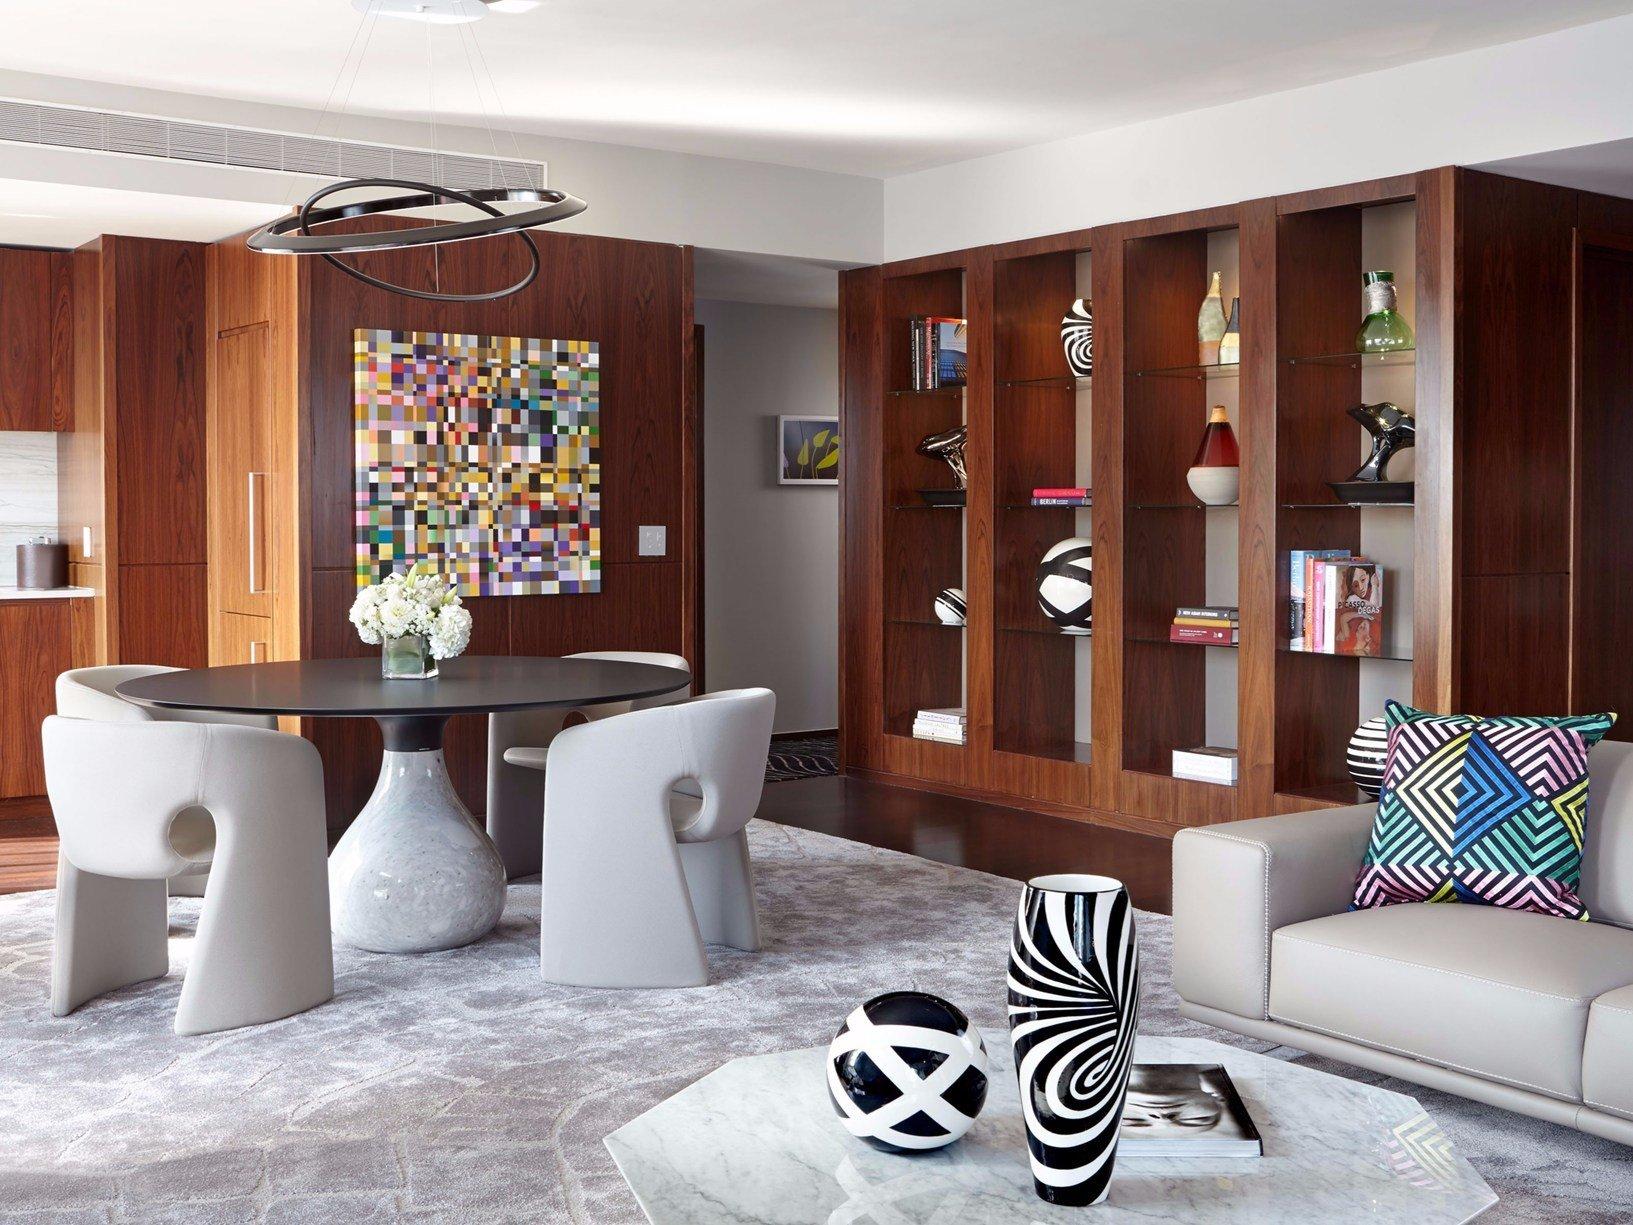 Emejing Roche E Bobois Gallery - Home Design Ideas 2017 - clubaleno.us